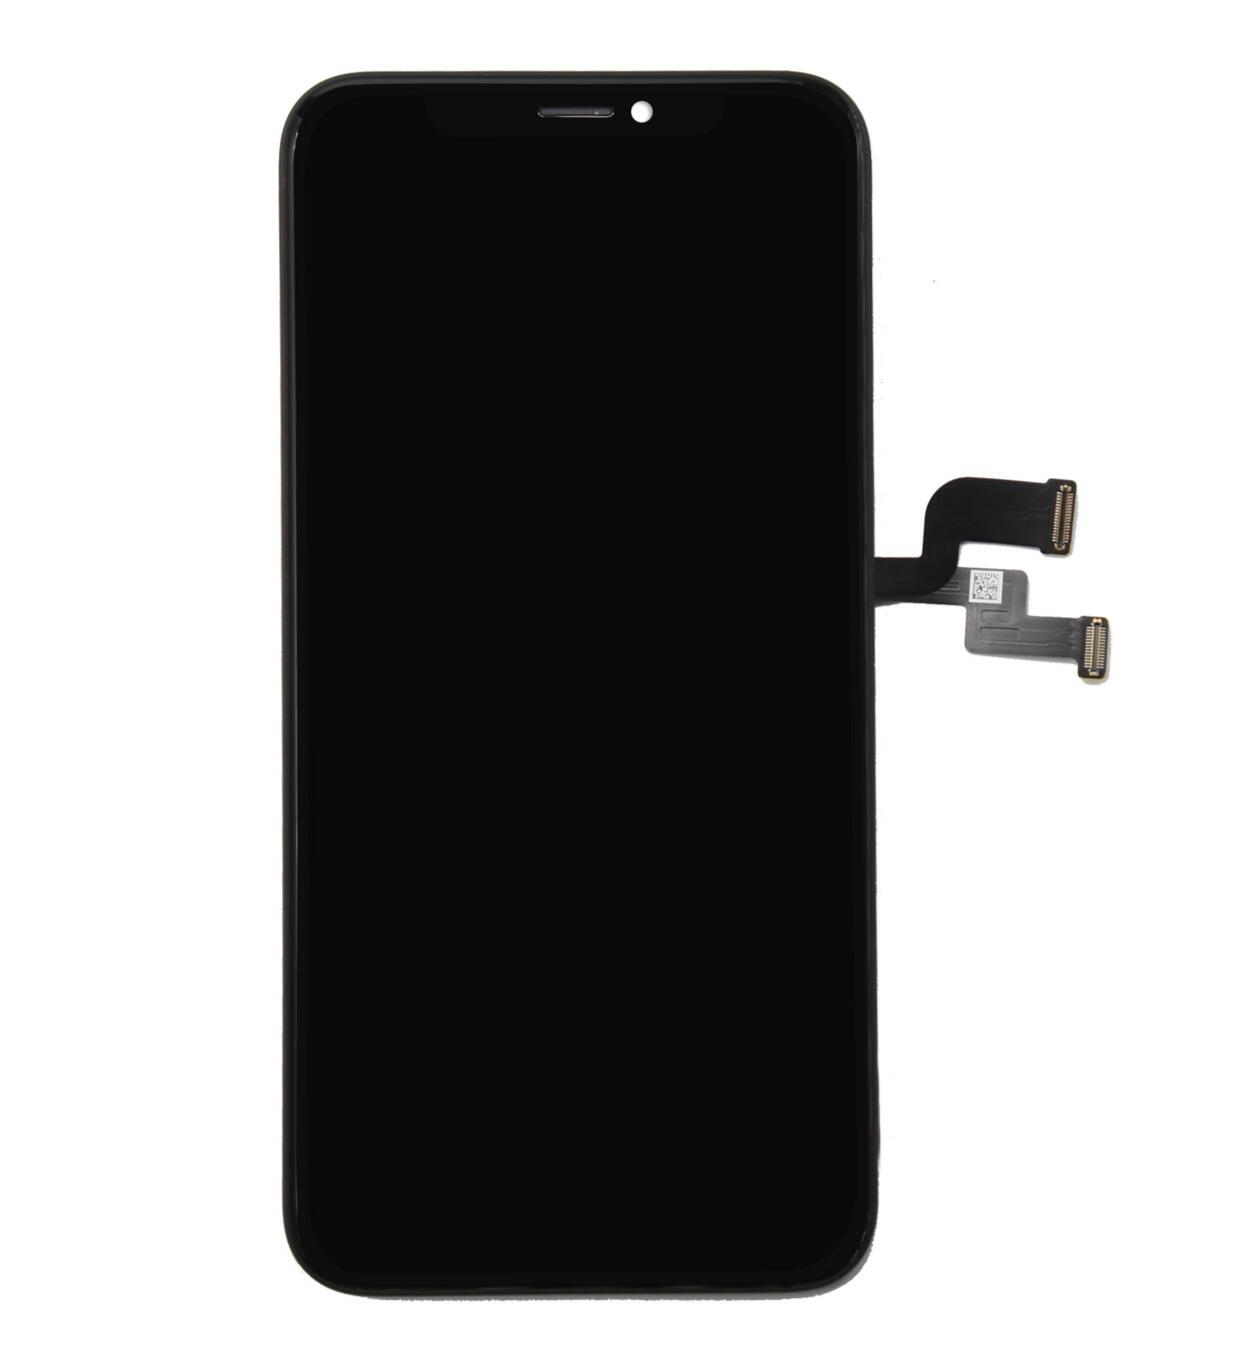 skärm flimrar iphone 6